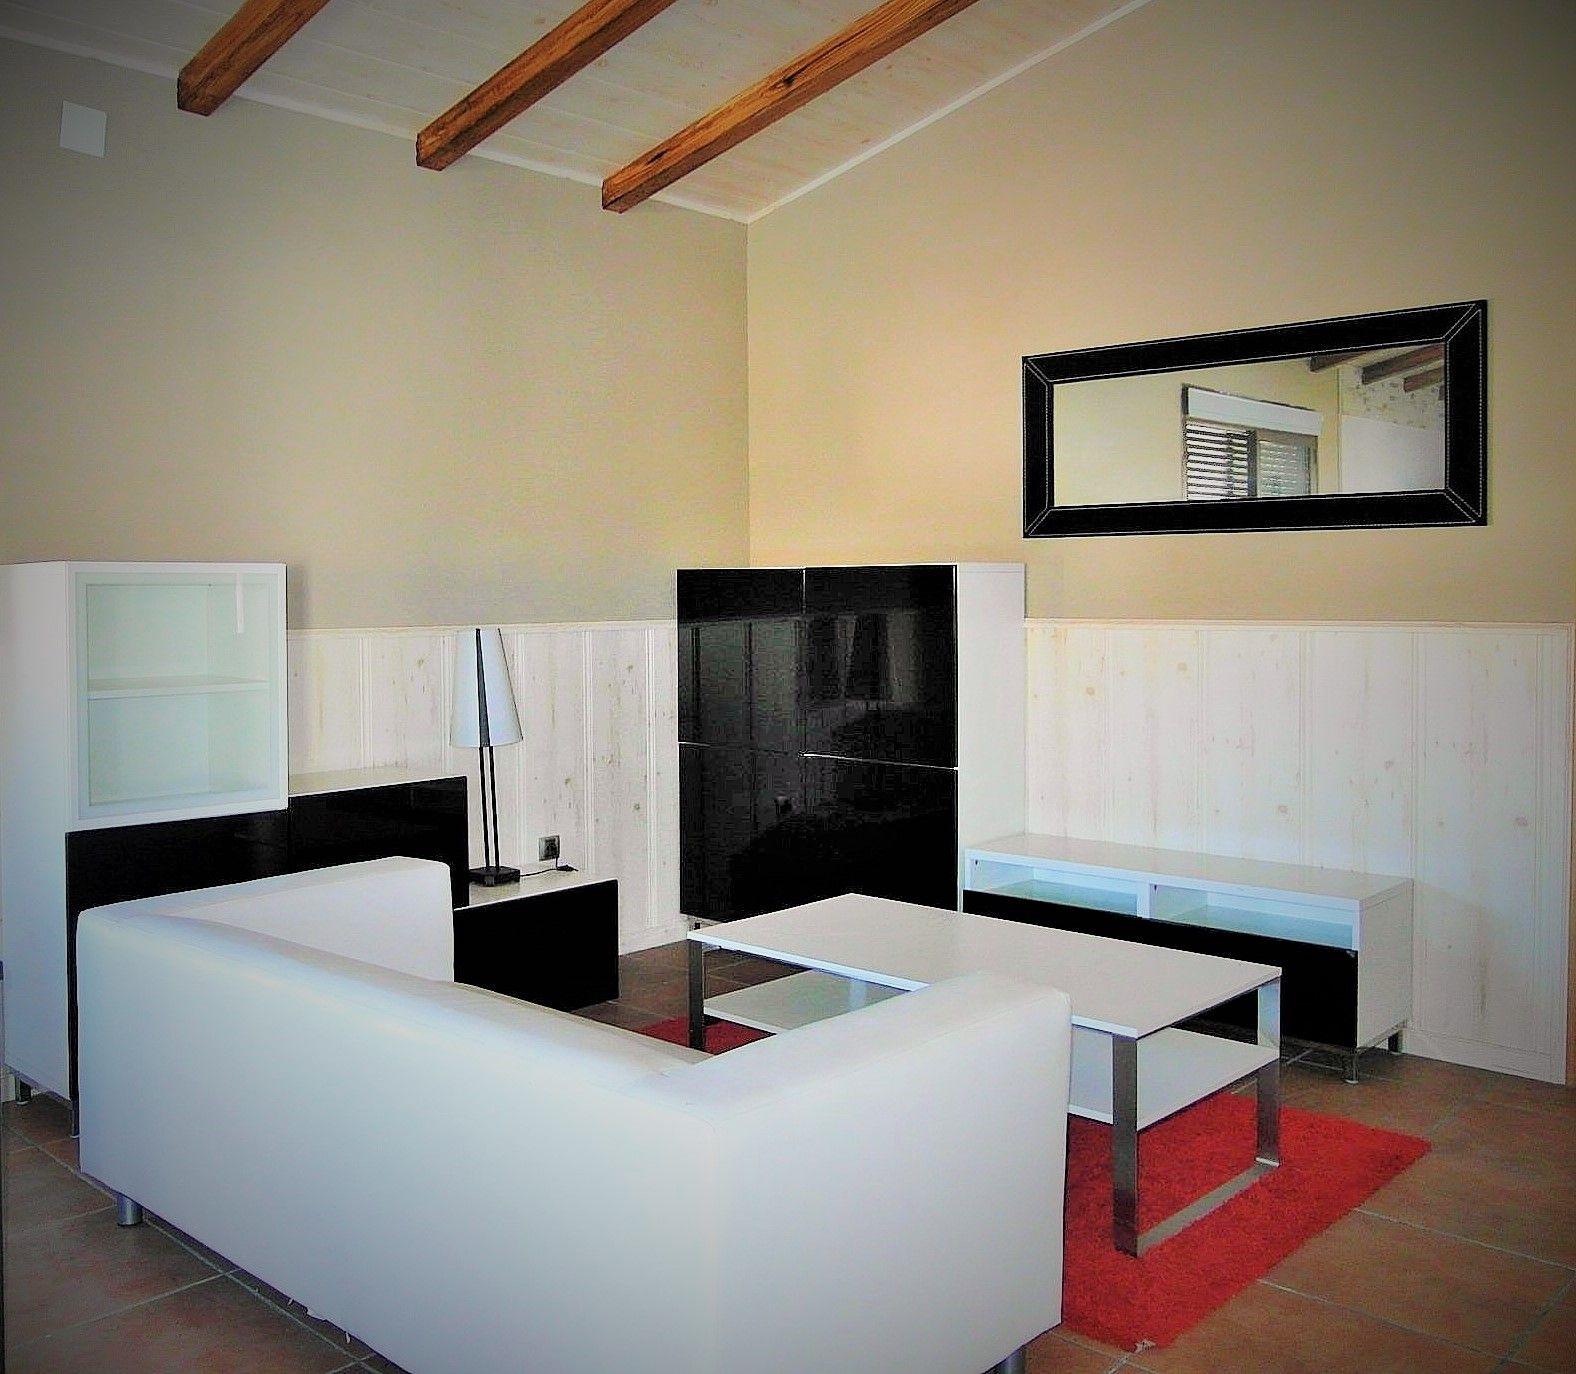 Salon de casa prefabricada de hormigon acabado zocalo de - Interiores de casas prefabricadas ...